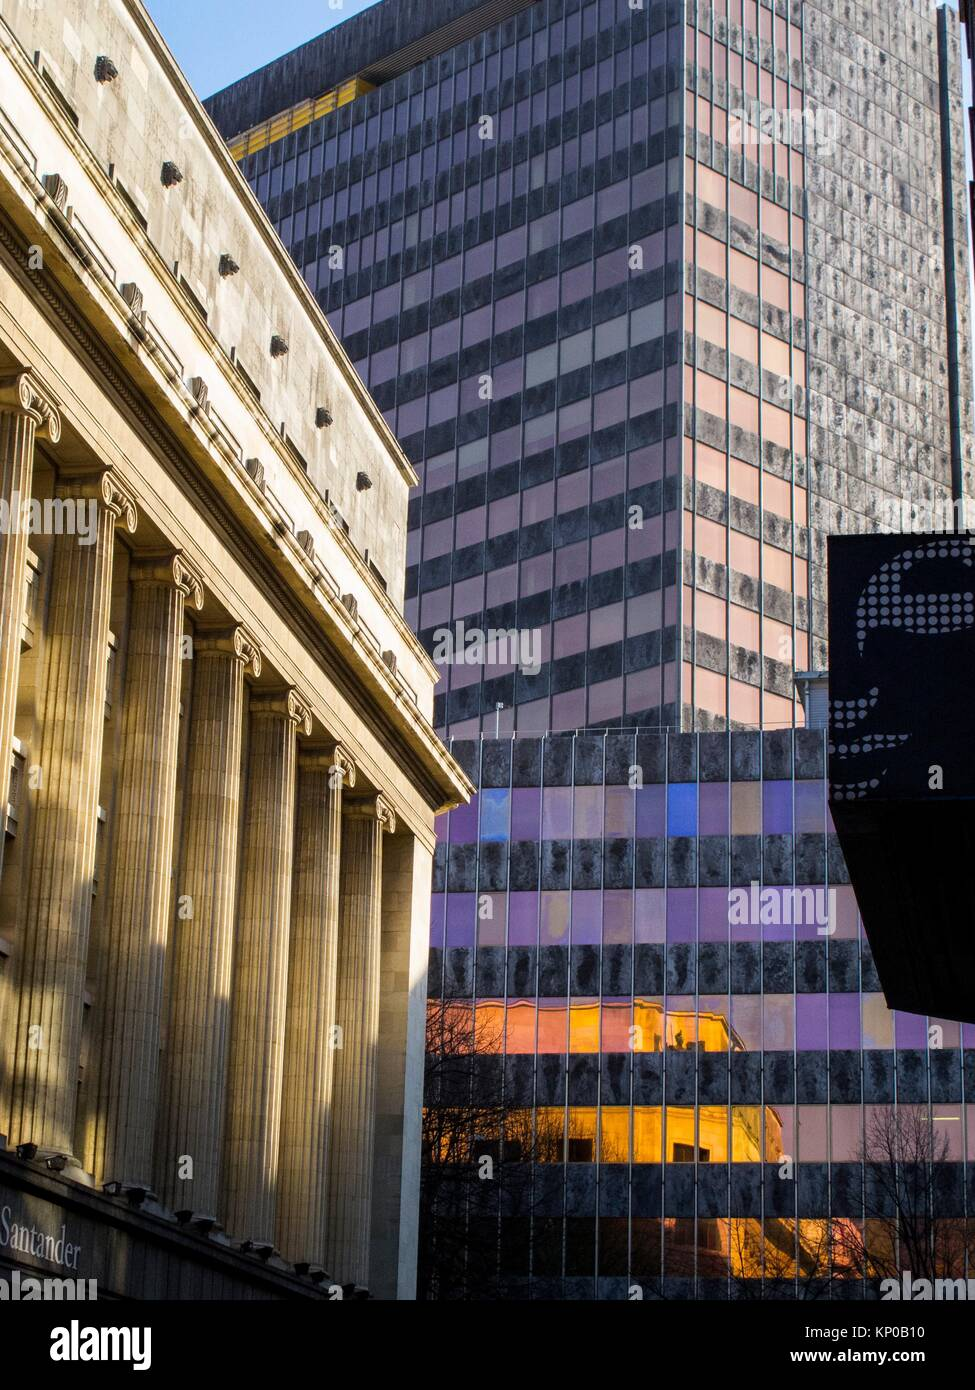 Despachos stock photos despachos stock images alamy for Oficina de correos bilbao